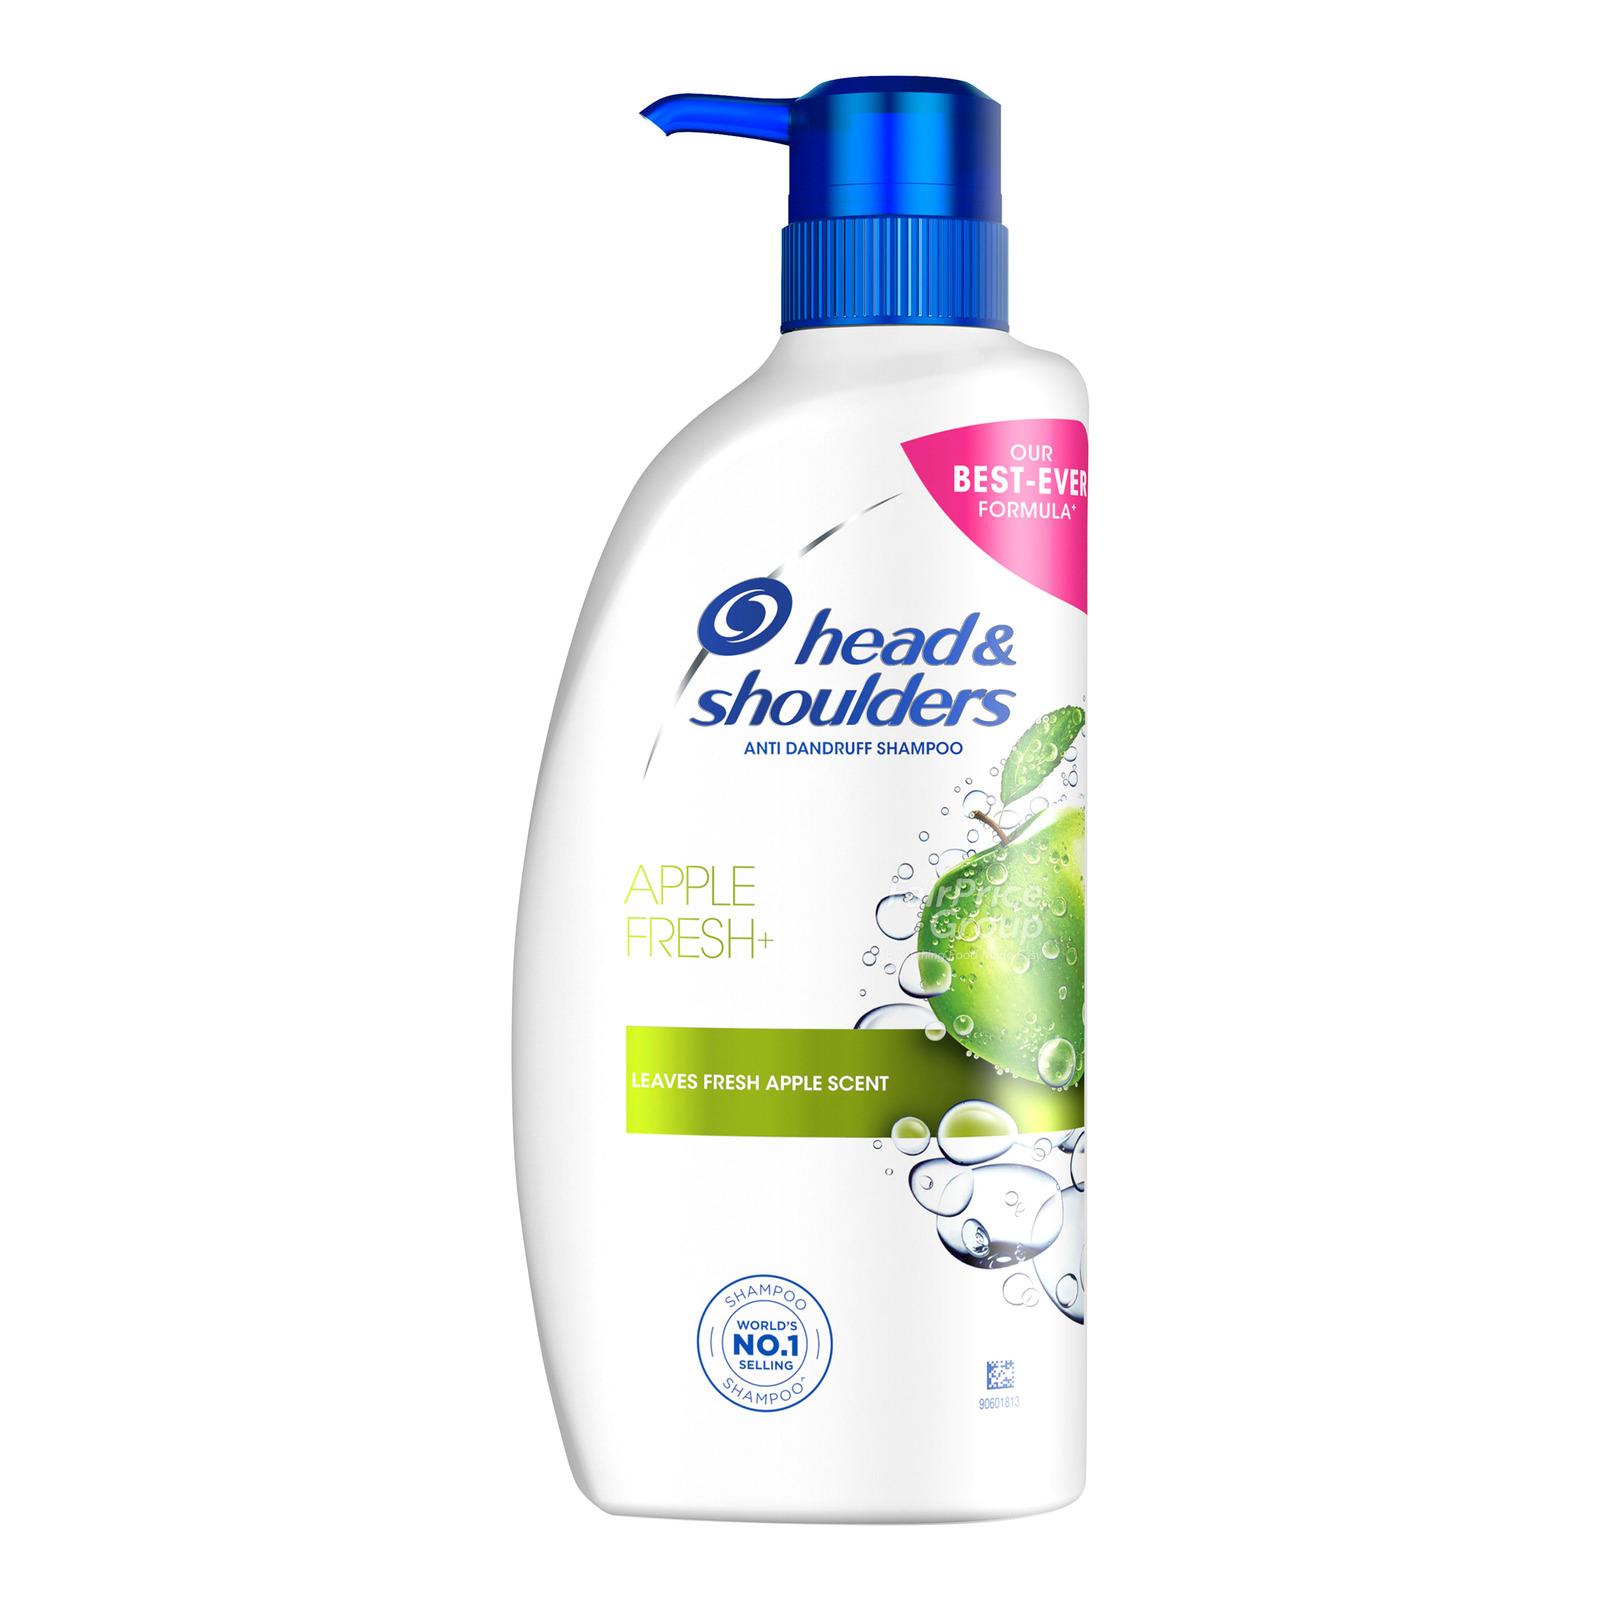 Head & Shoulders Anti-Dandruff Shampoo - Apple Fresh